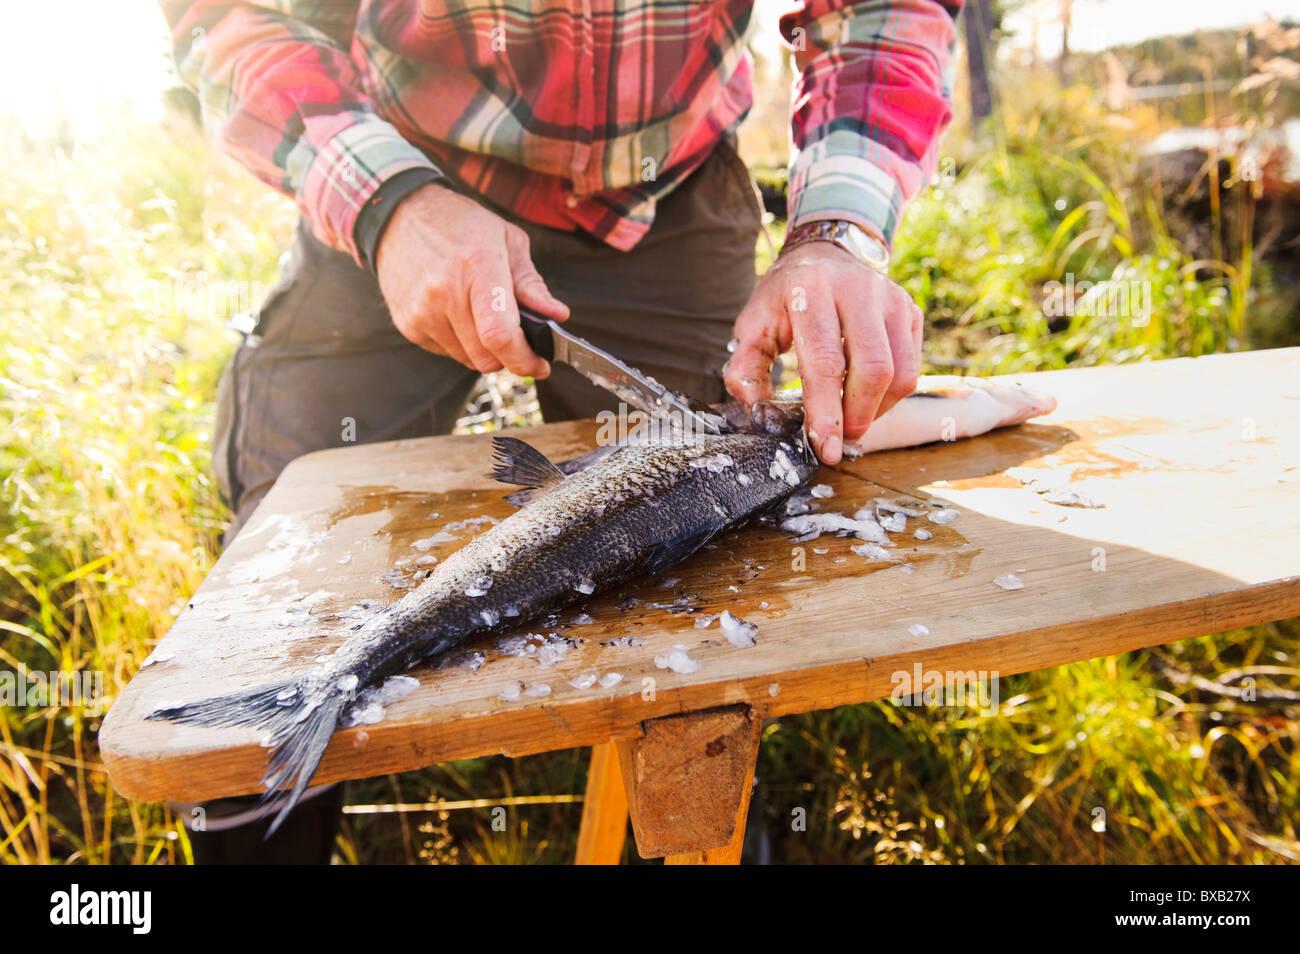 Senior man preparing fish - Stock Image